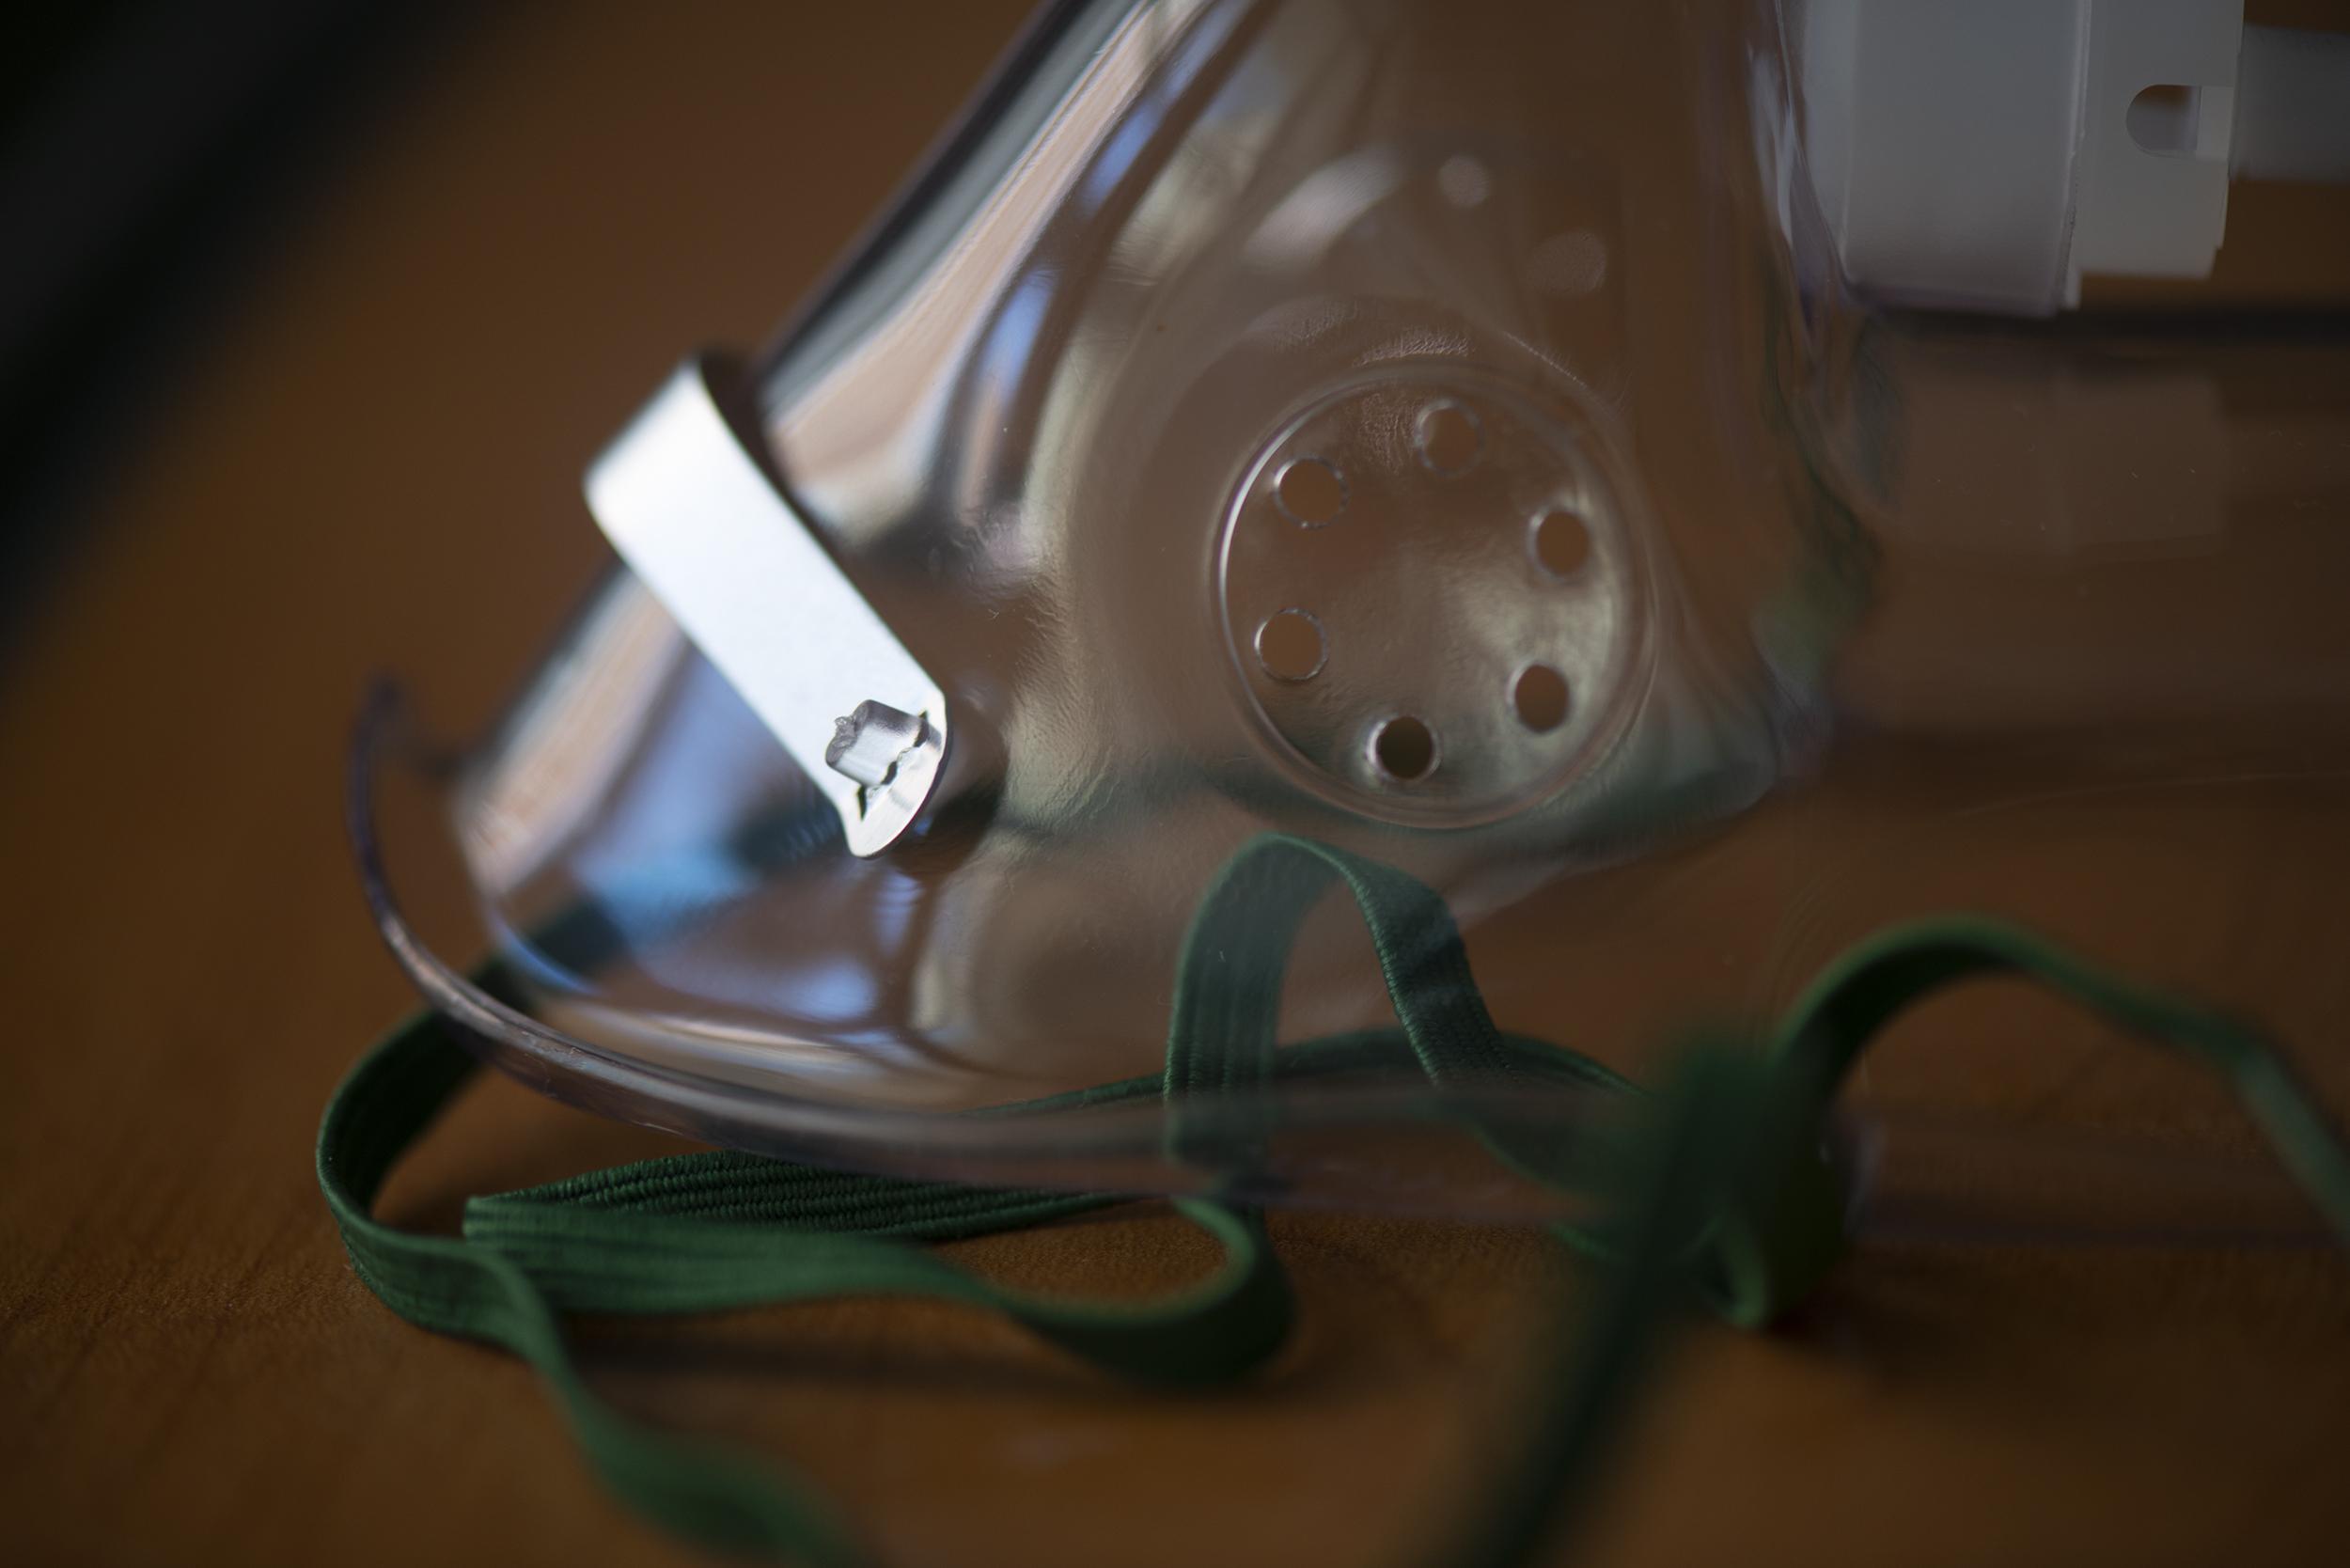 Supplemental oxygen mask